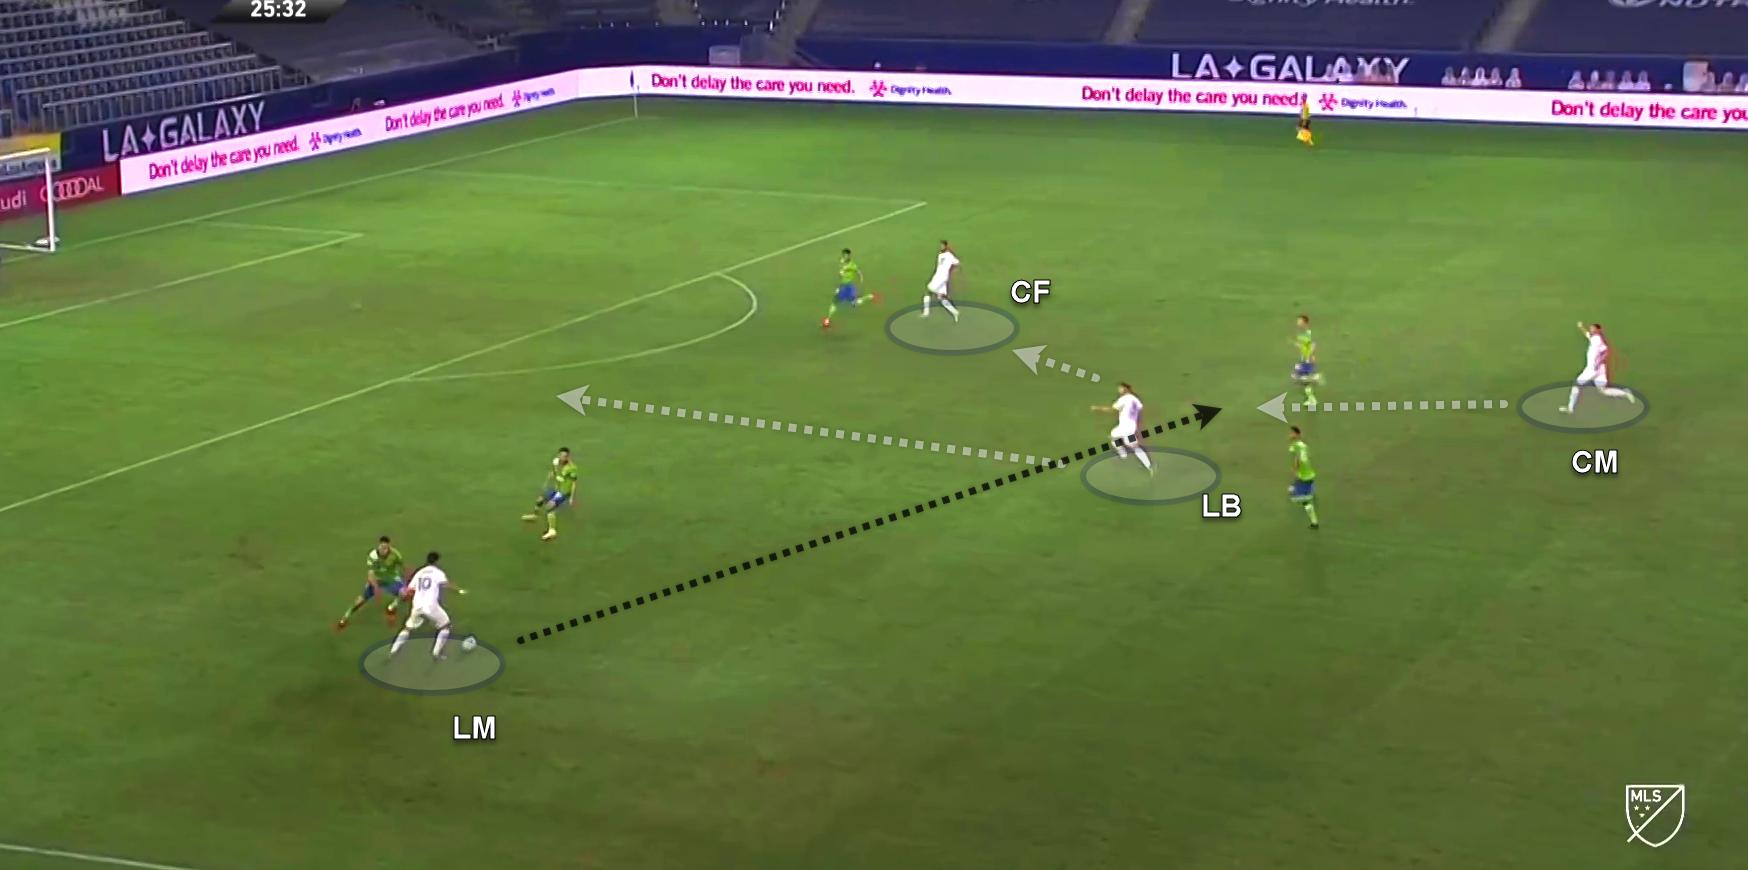 MLS 2020: LA Galaxy v Seattle Sounders - tactical analysis tactics